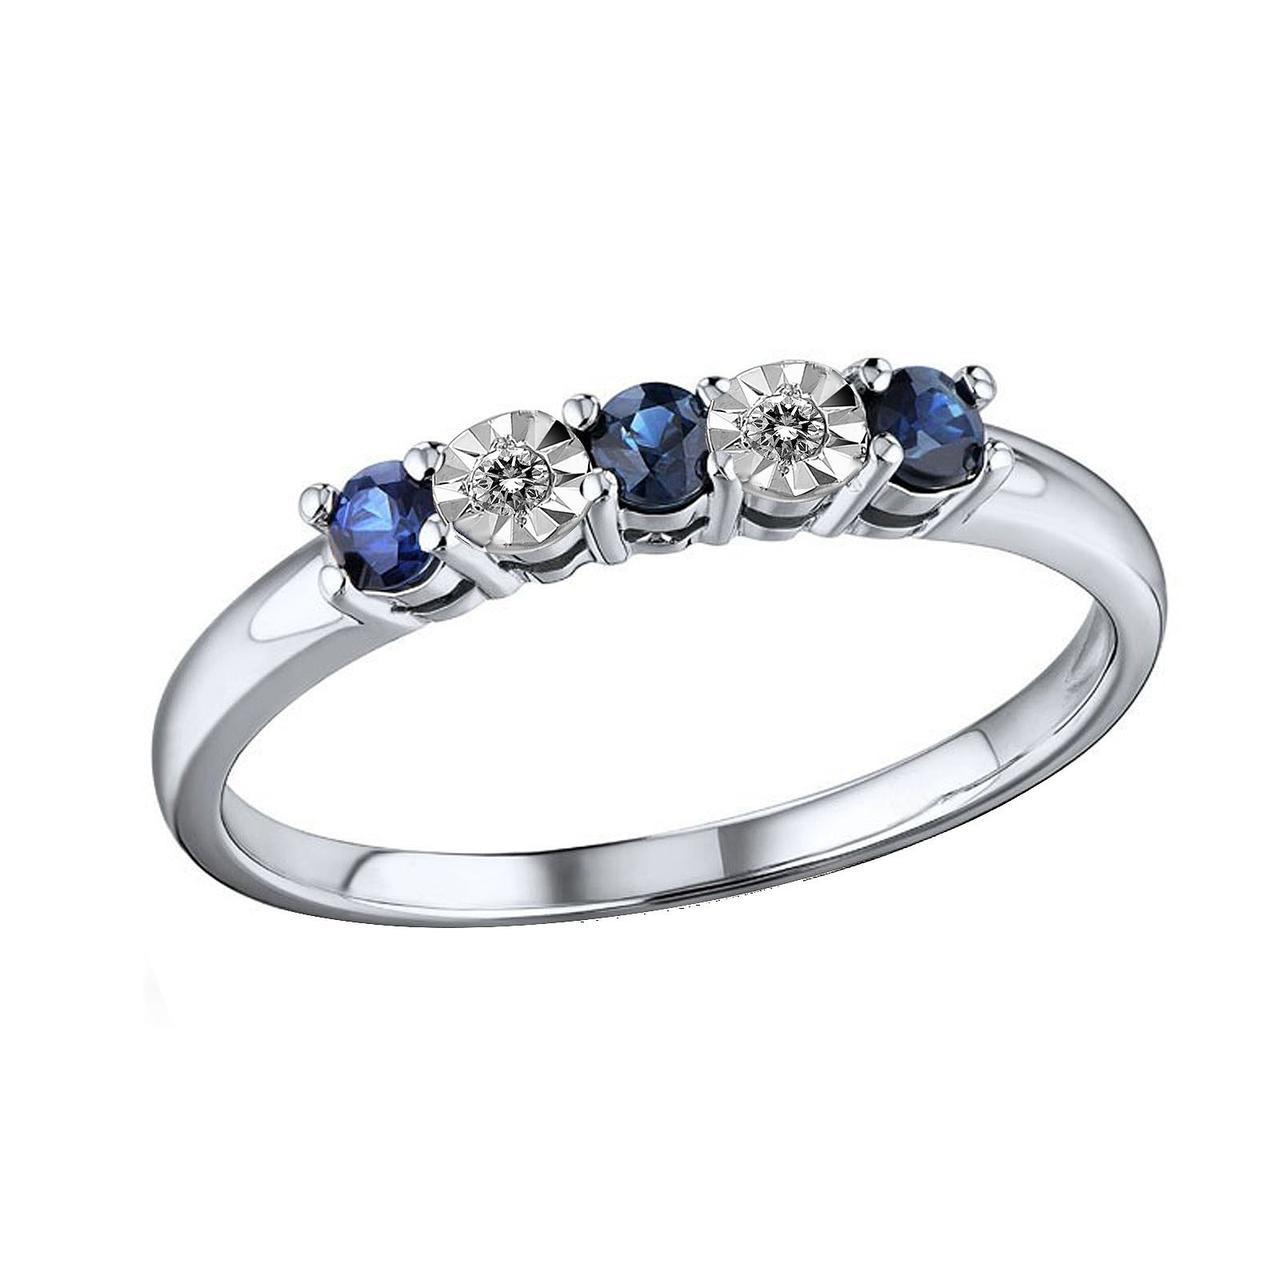 Золотое кольцо с бриллиантами и сапфирами, размер 15 (445909)